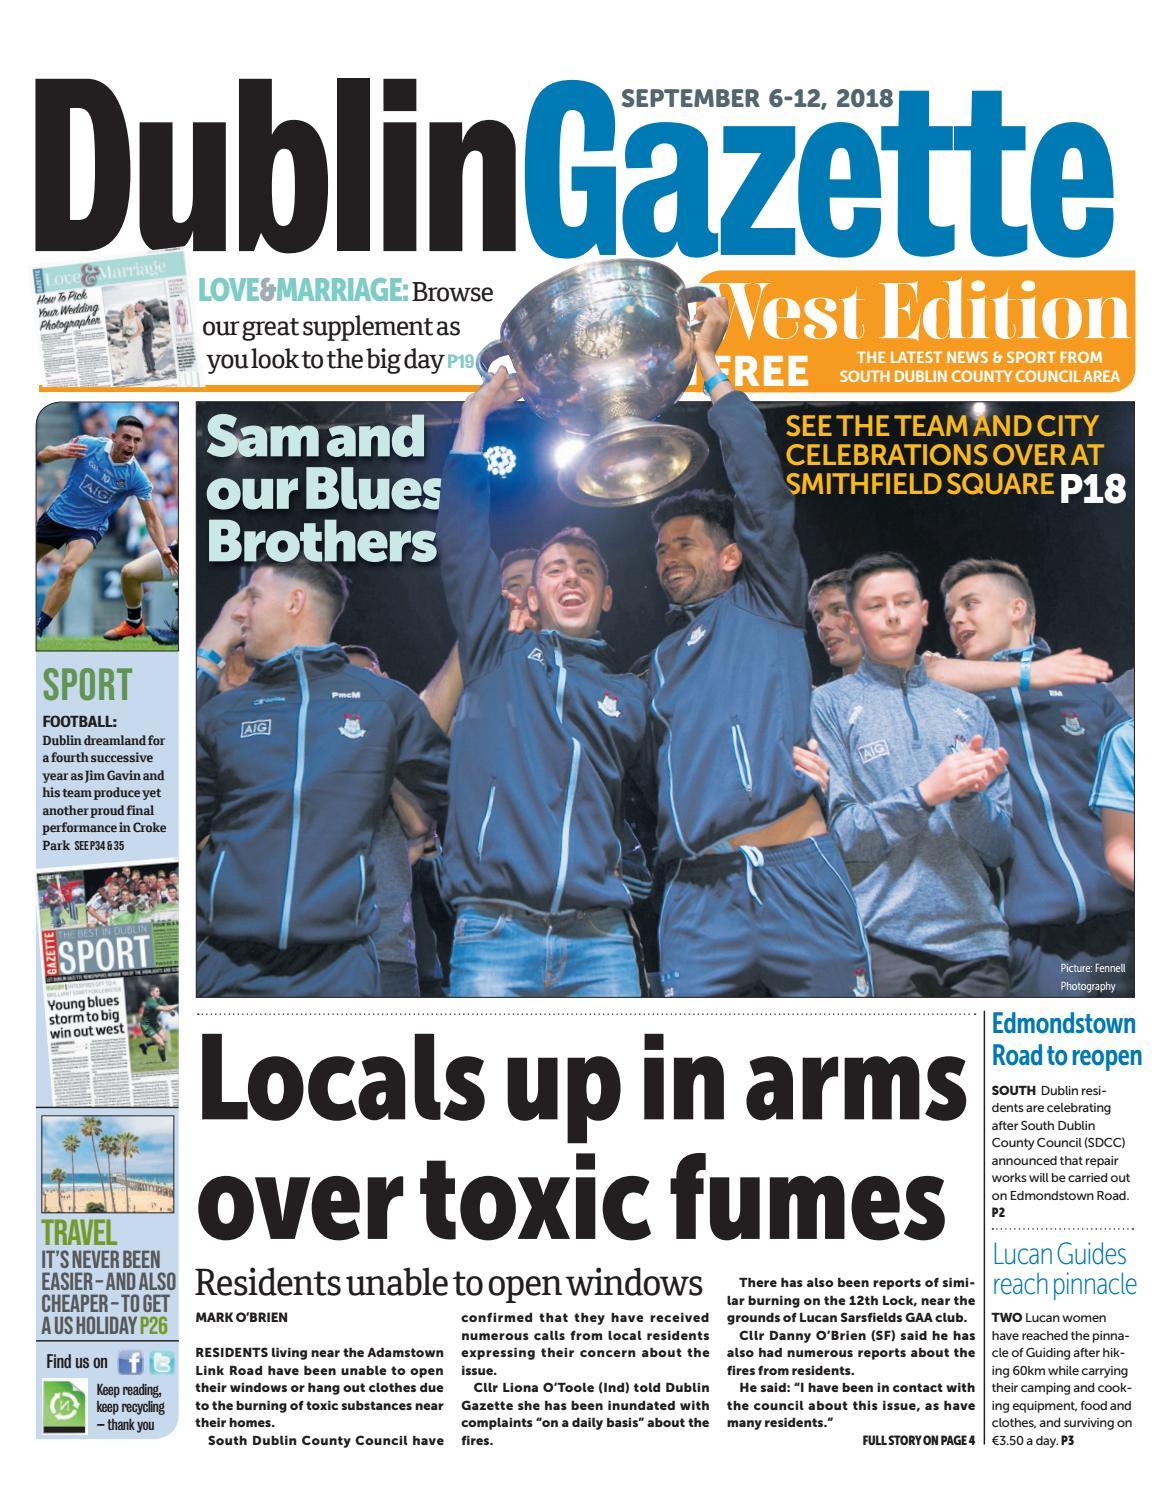 Dublin Gazette: West Edition by Dublin Gazette - issuu